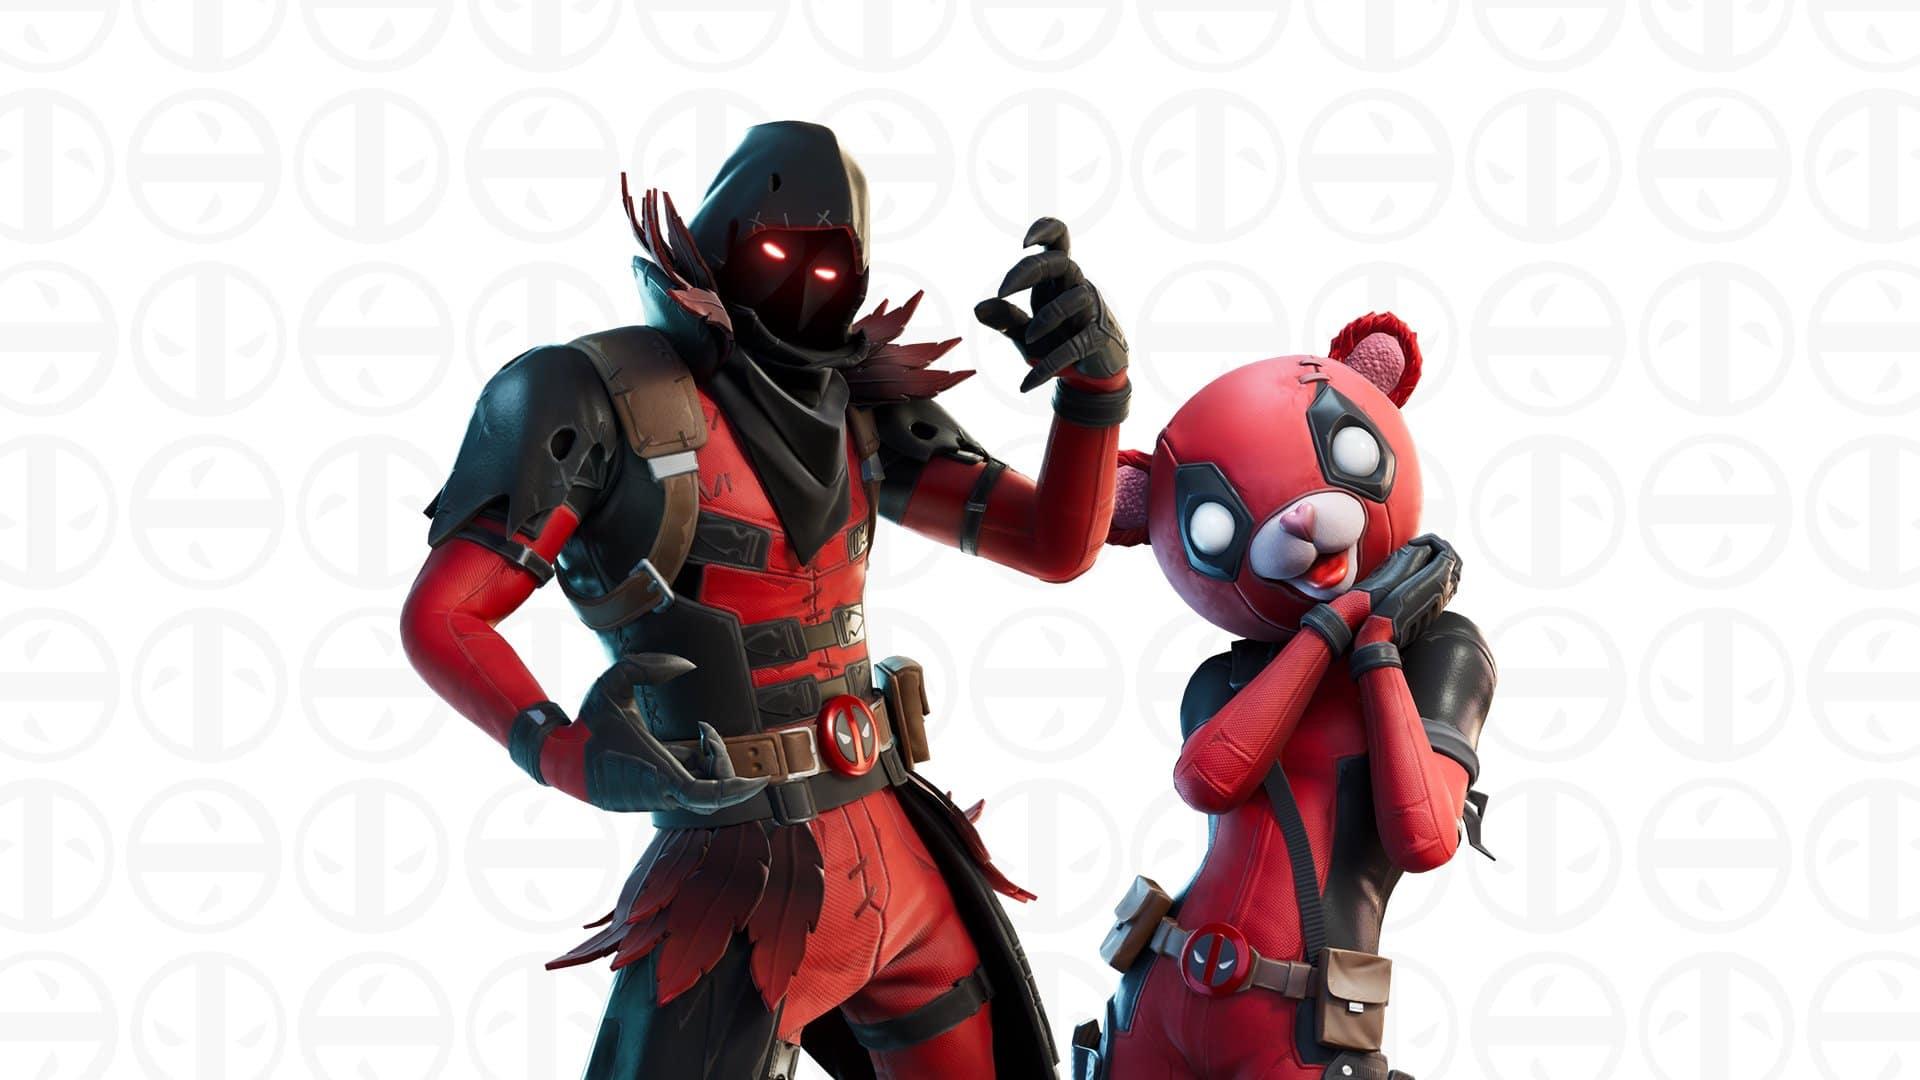 Fortnite Deadpool Week 8 Challenges And Unmasked Deadpool Skin Style Fortnite Insider